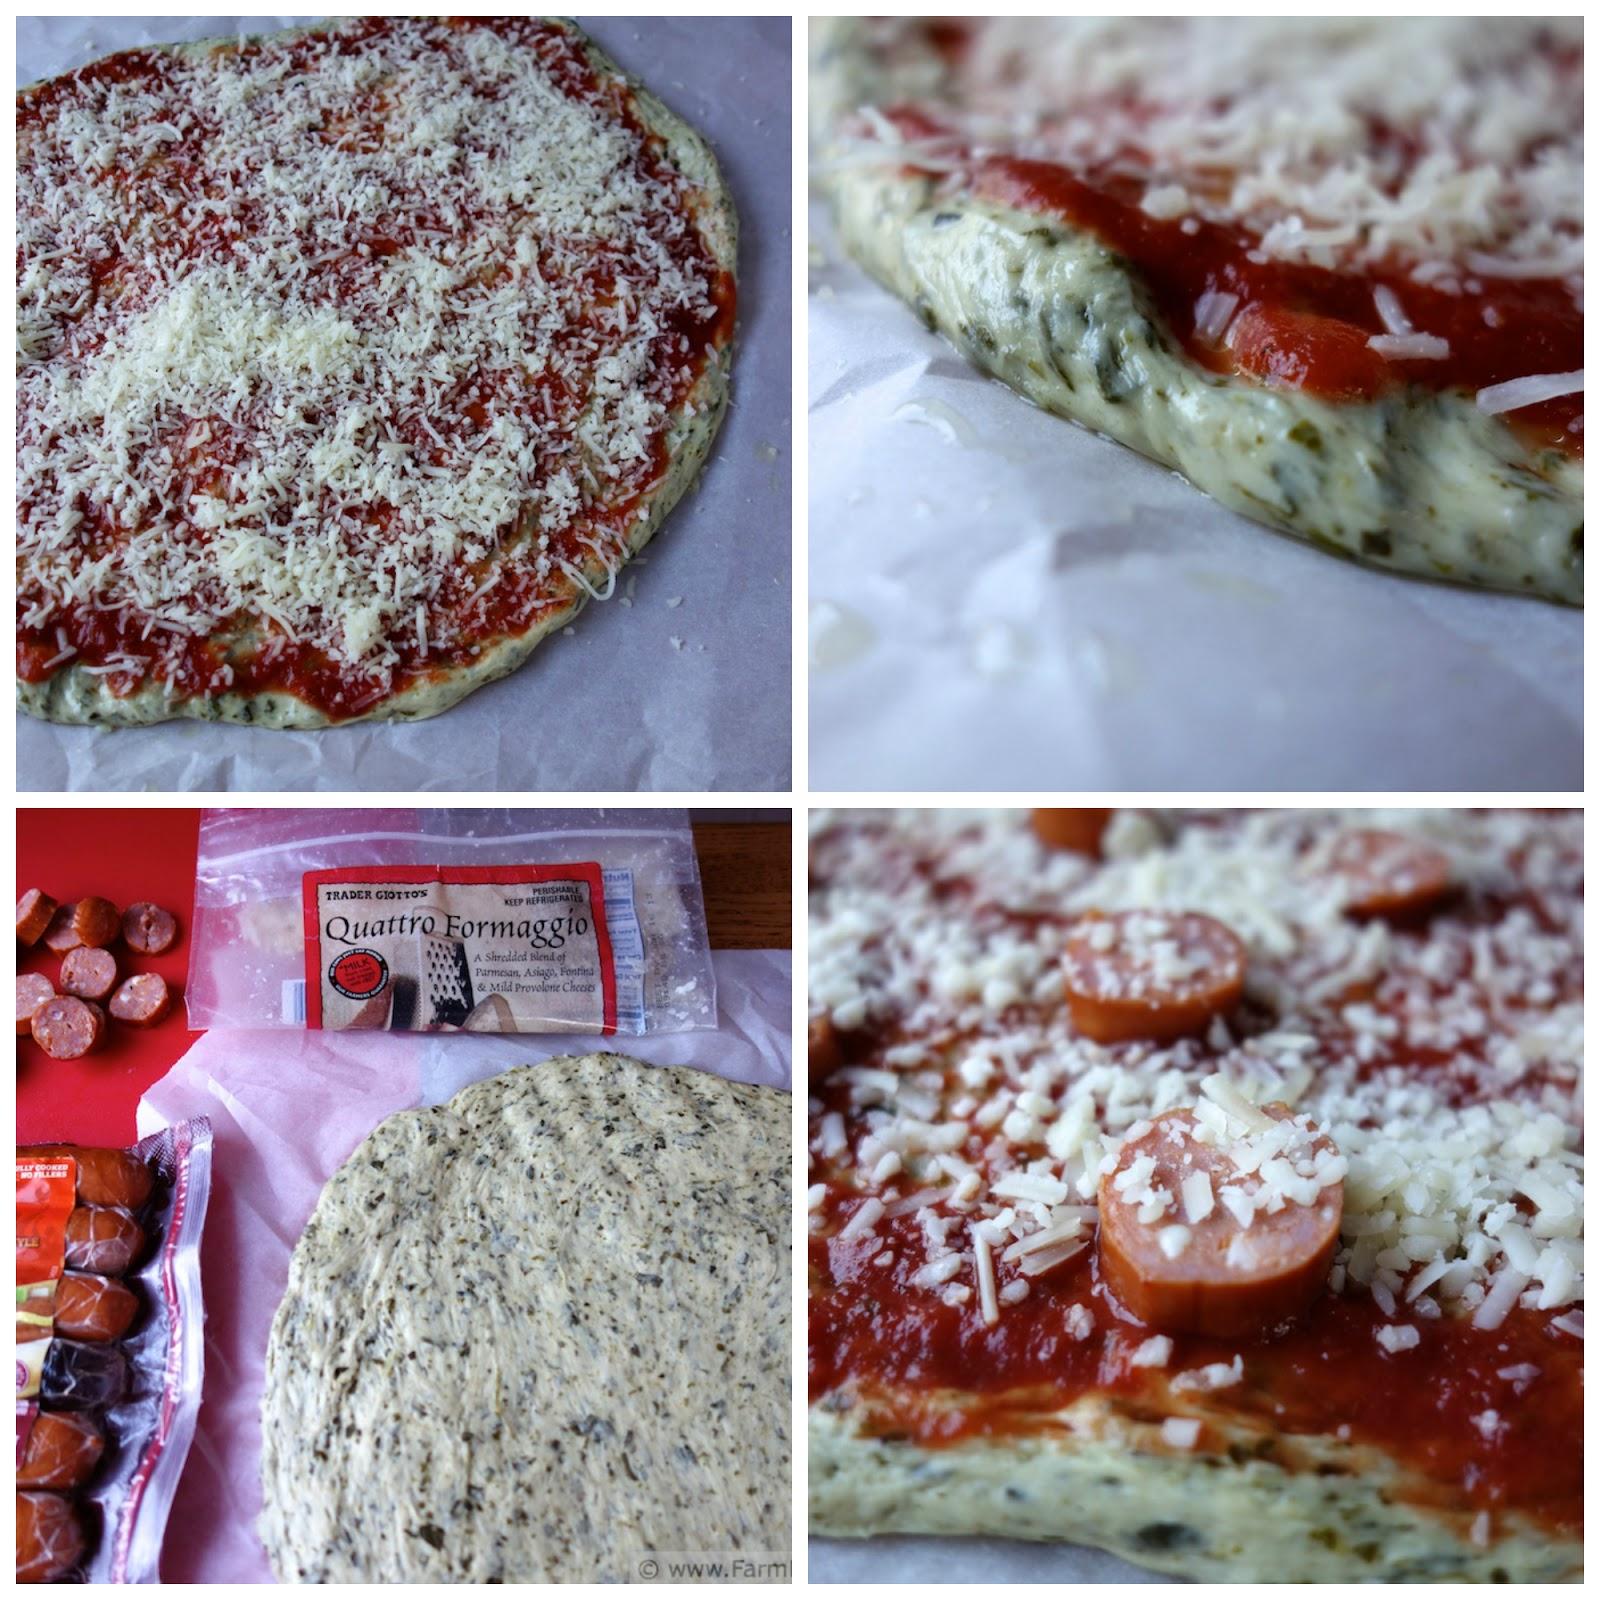 ... .farmfreshfeasts.com/2013/06/basic-kale-pizza-dough-pizza-night.html